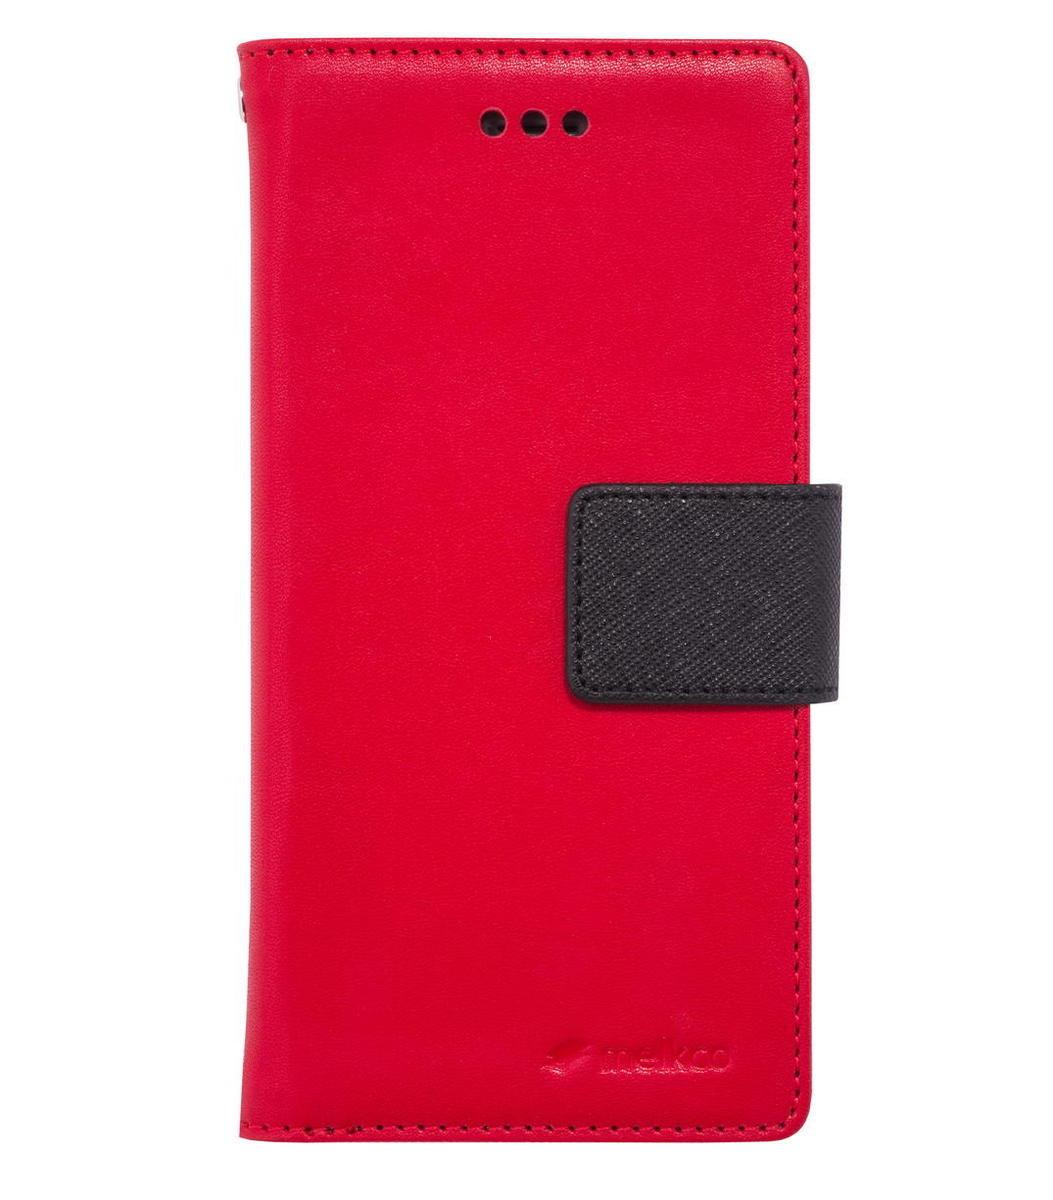 "iPhone 6 Plus/6S Plus 5.5"" Pure 系列 人造皮手機套 - 紅色/黑色"